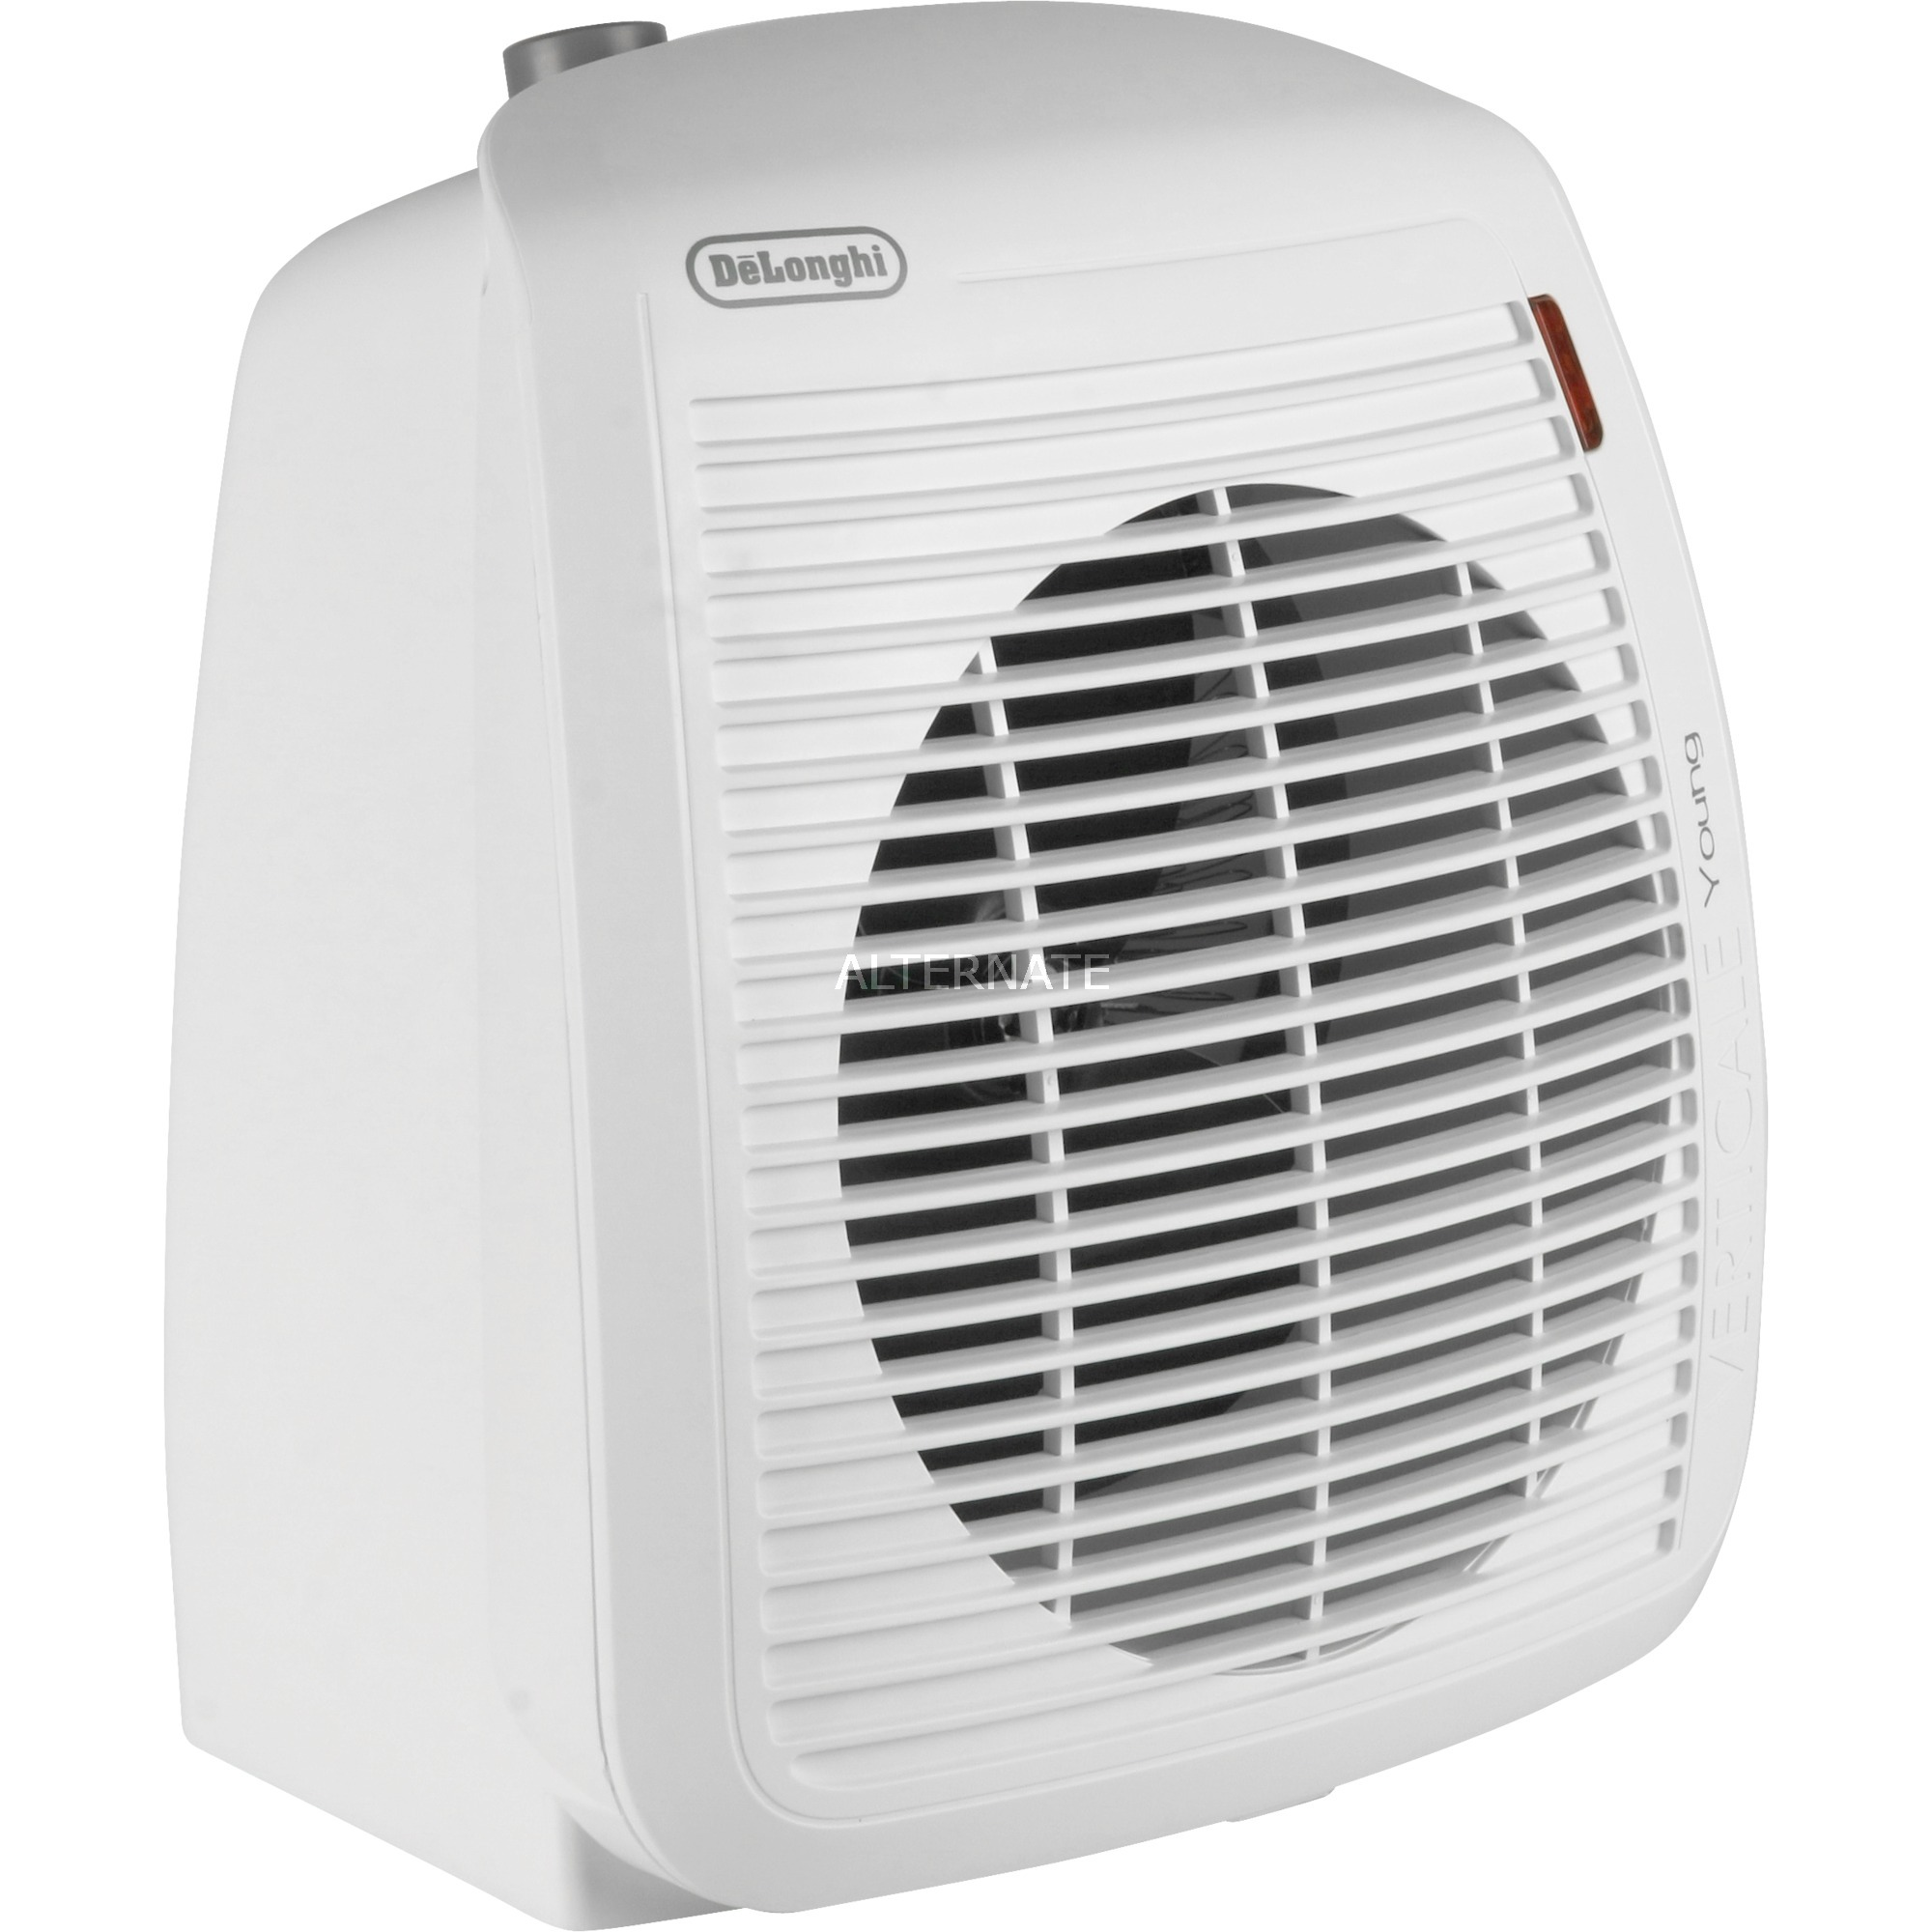 HVY1020.W Interior Blanco 2000W Calentador eléctrico de ventilador calefactor eléctrico, Termoventiladores